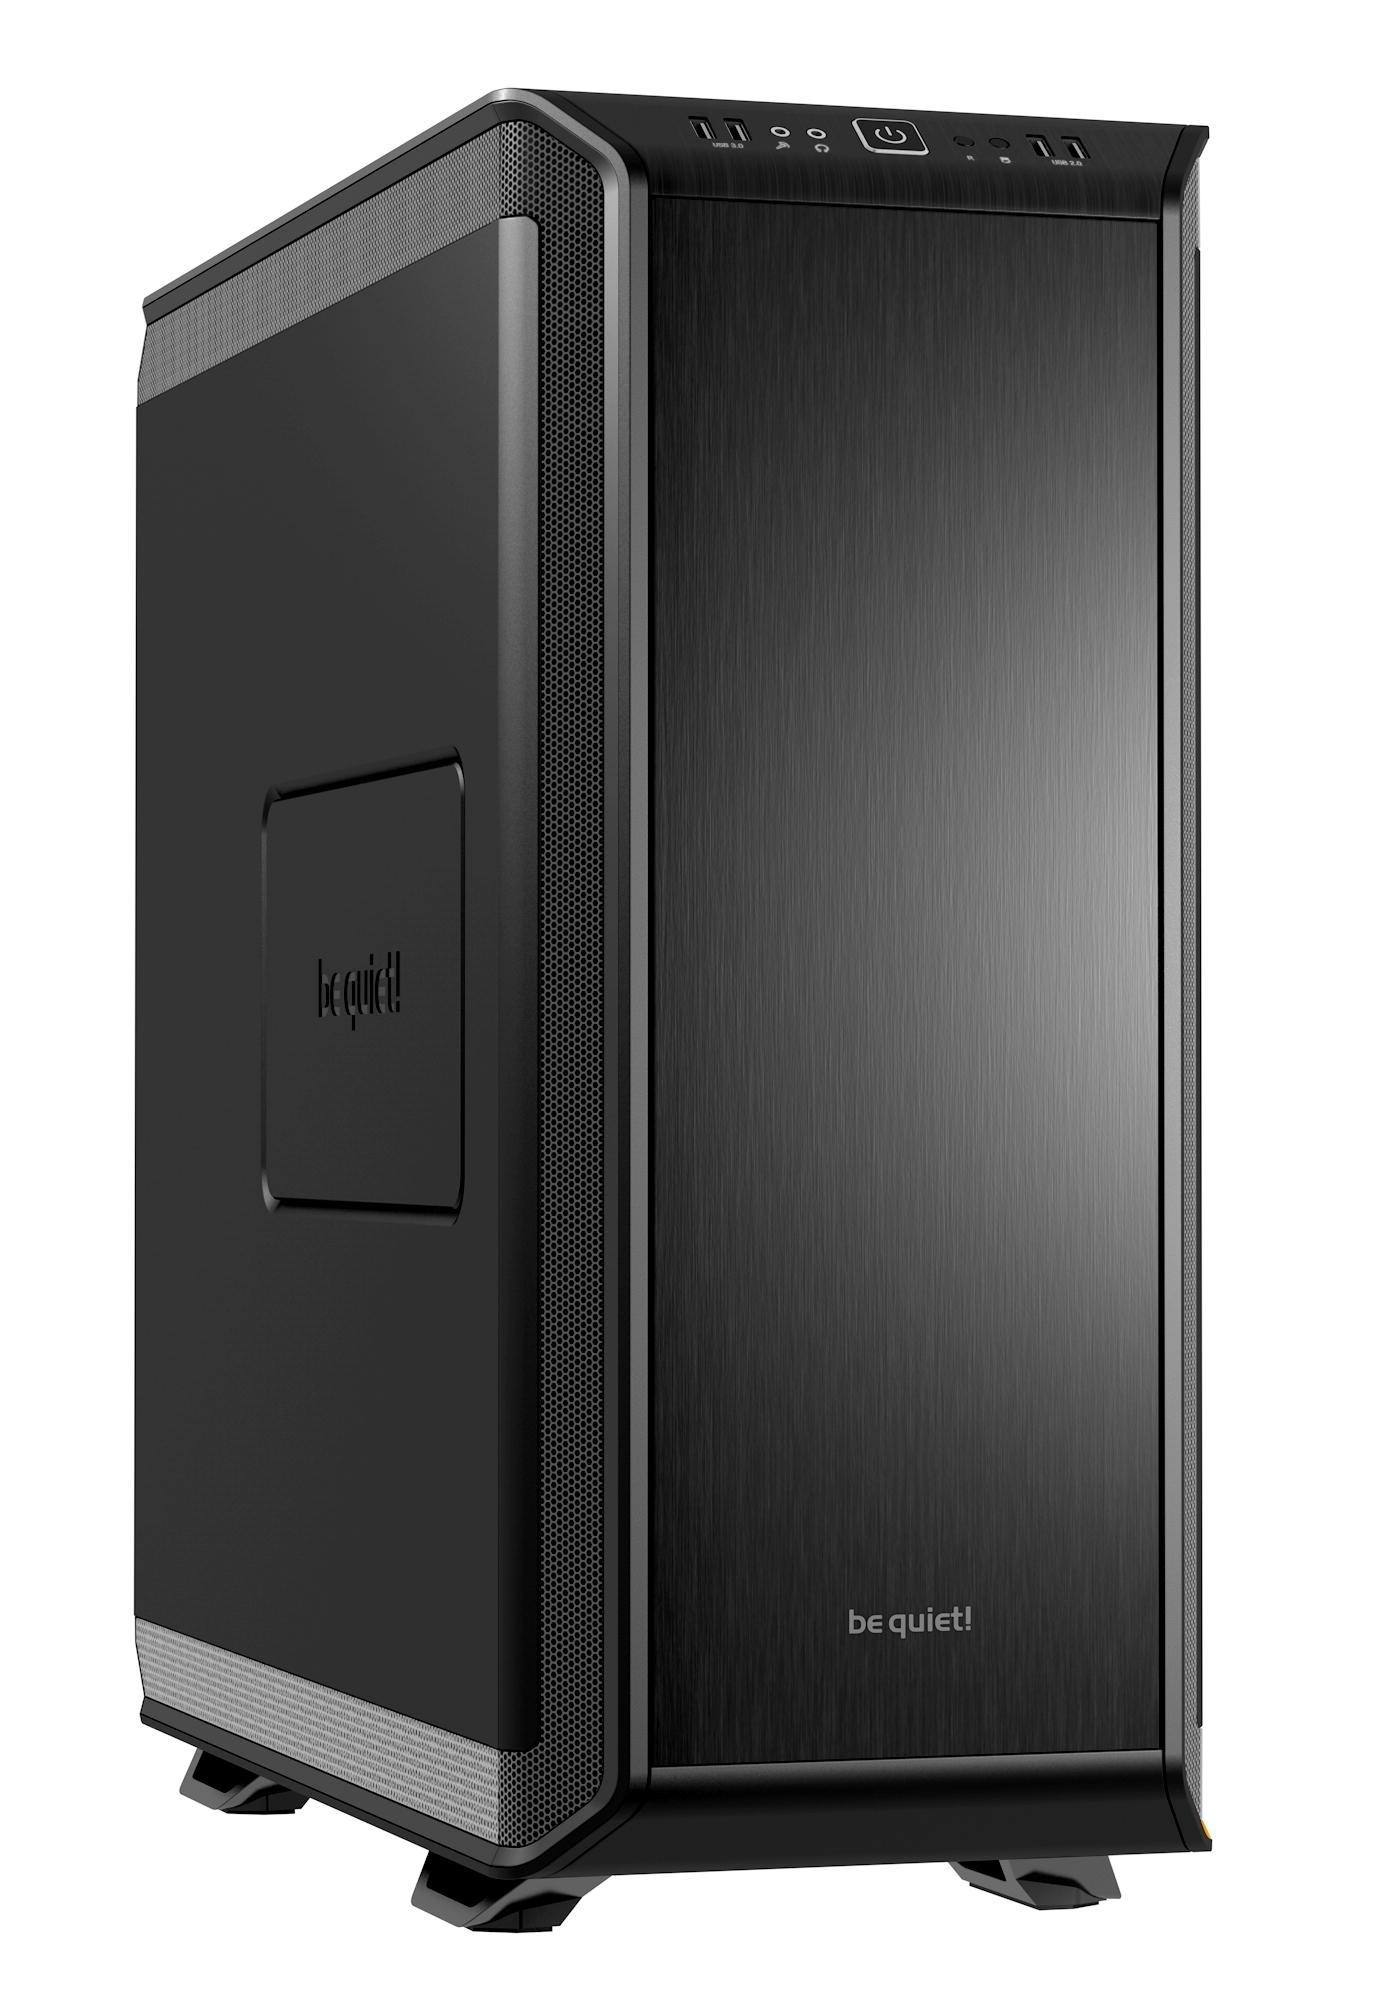 Pc Case - Dark Base 900 Black Housing